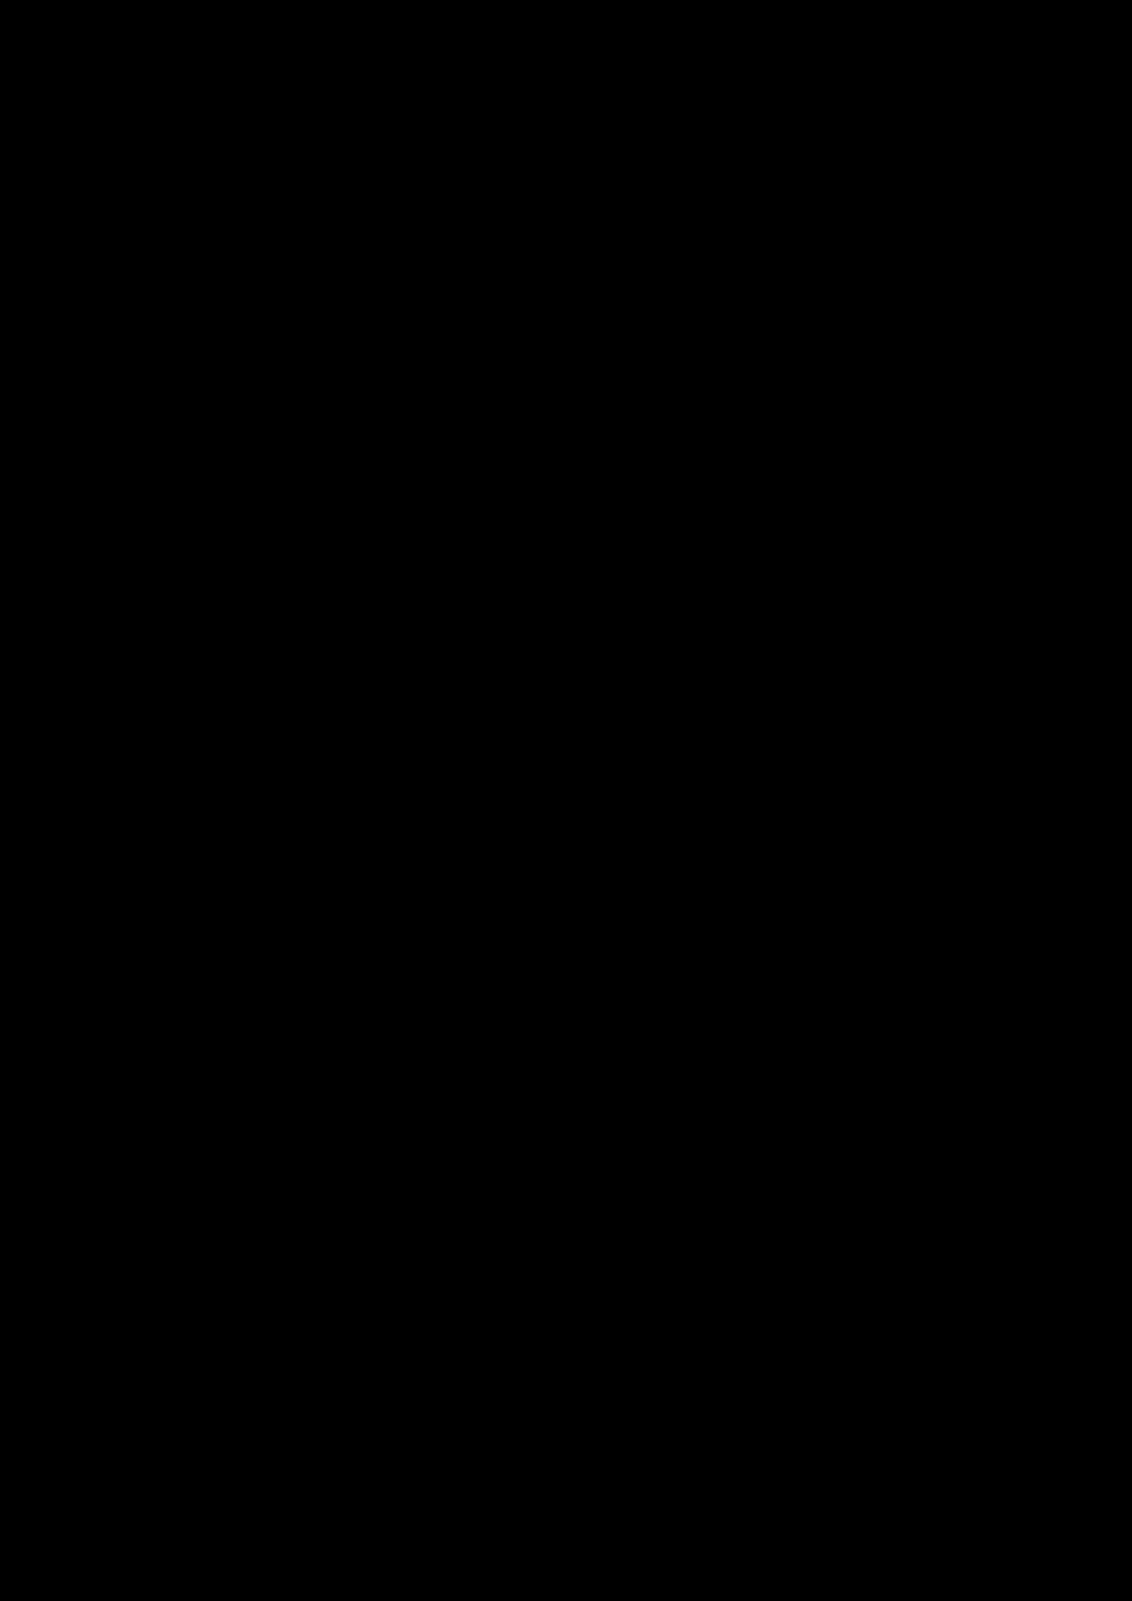 Ten lyubvi slide, Image 59